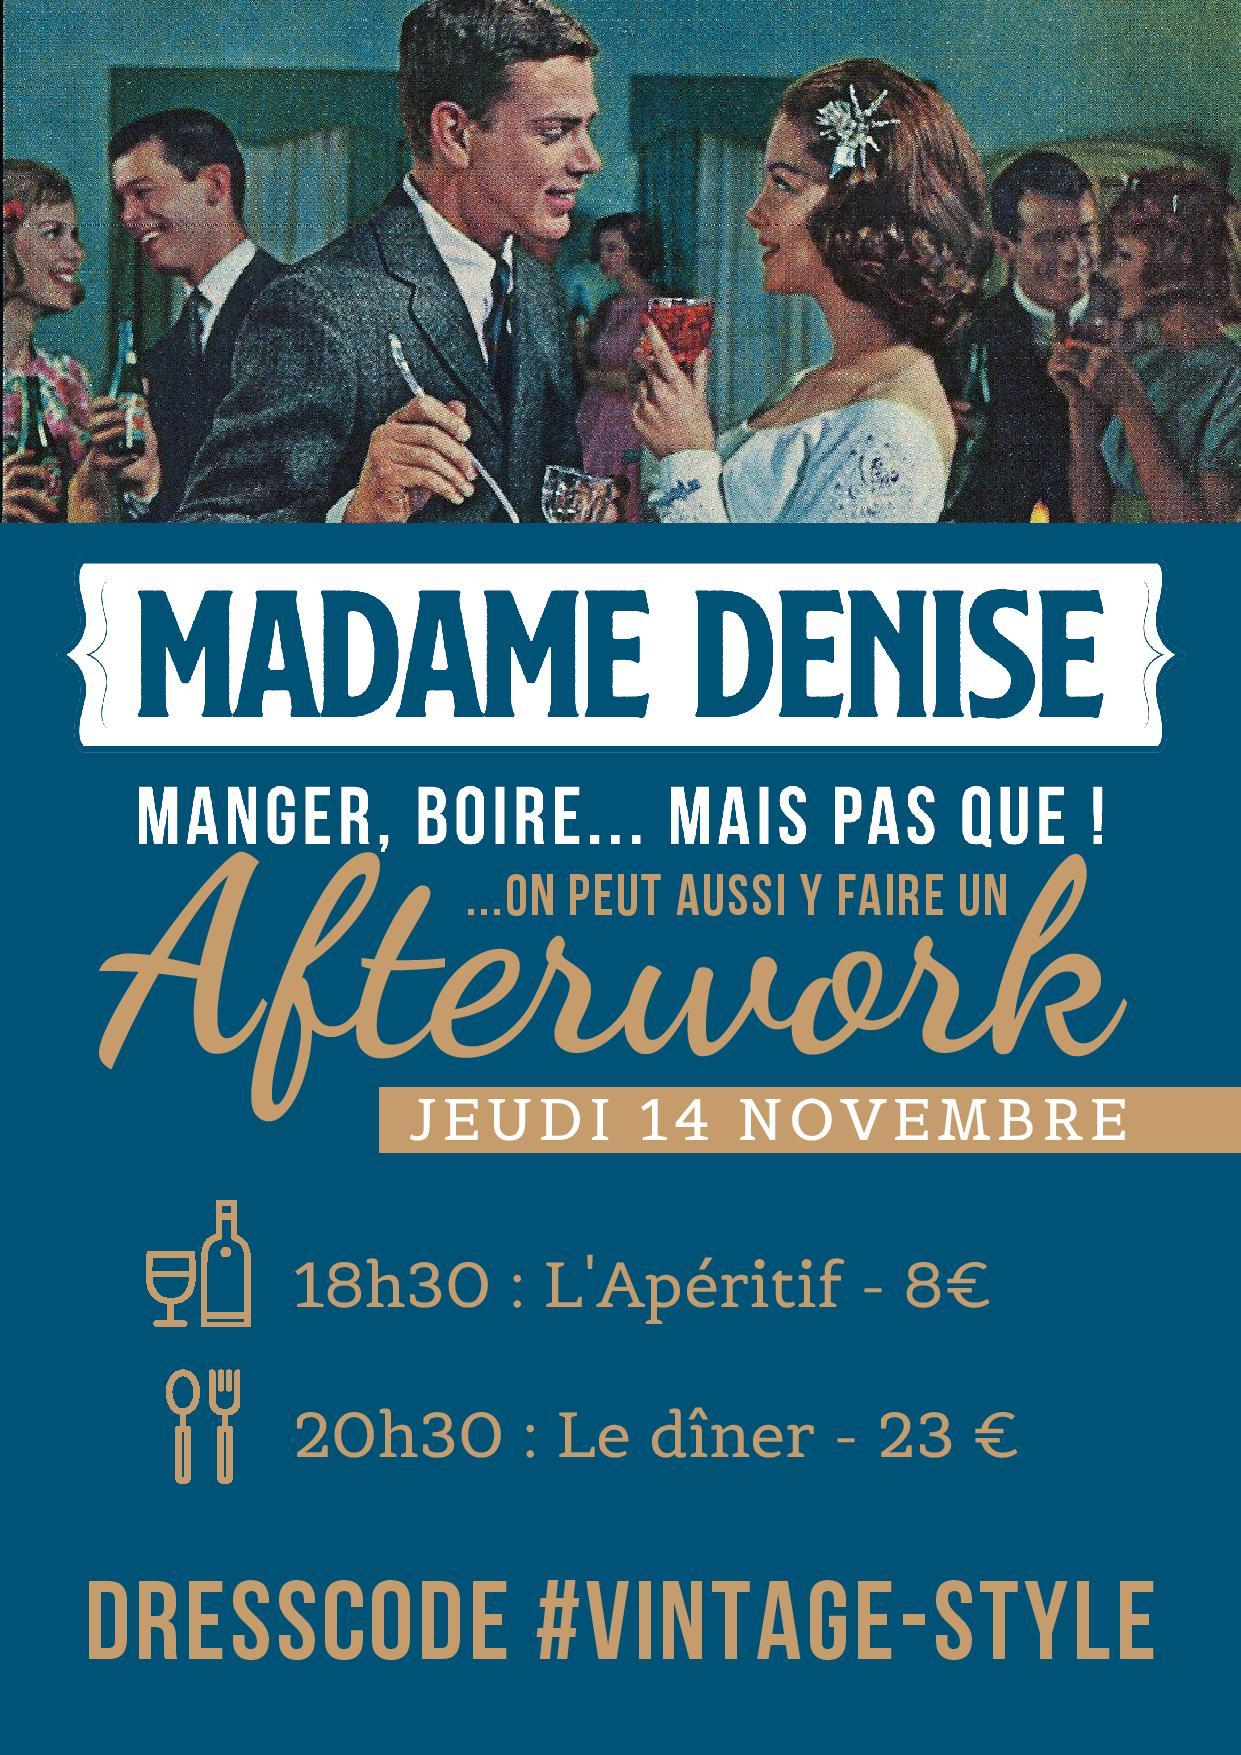 AFTERWORK - Madame Denise - Apéritif